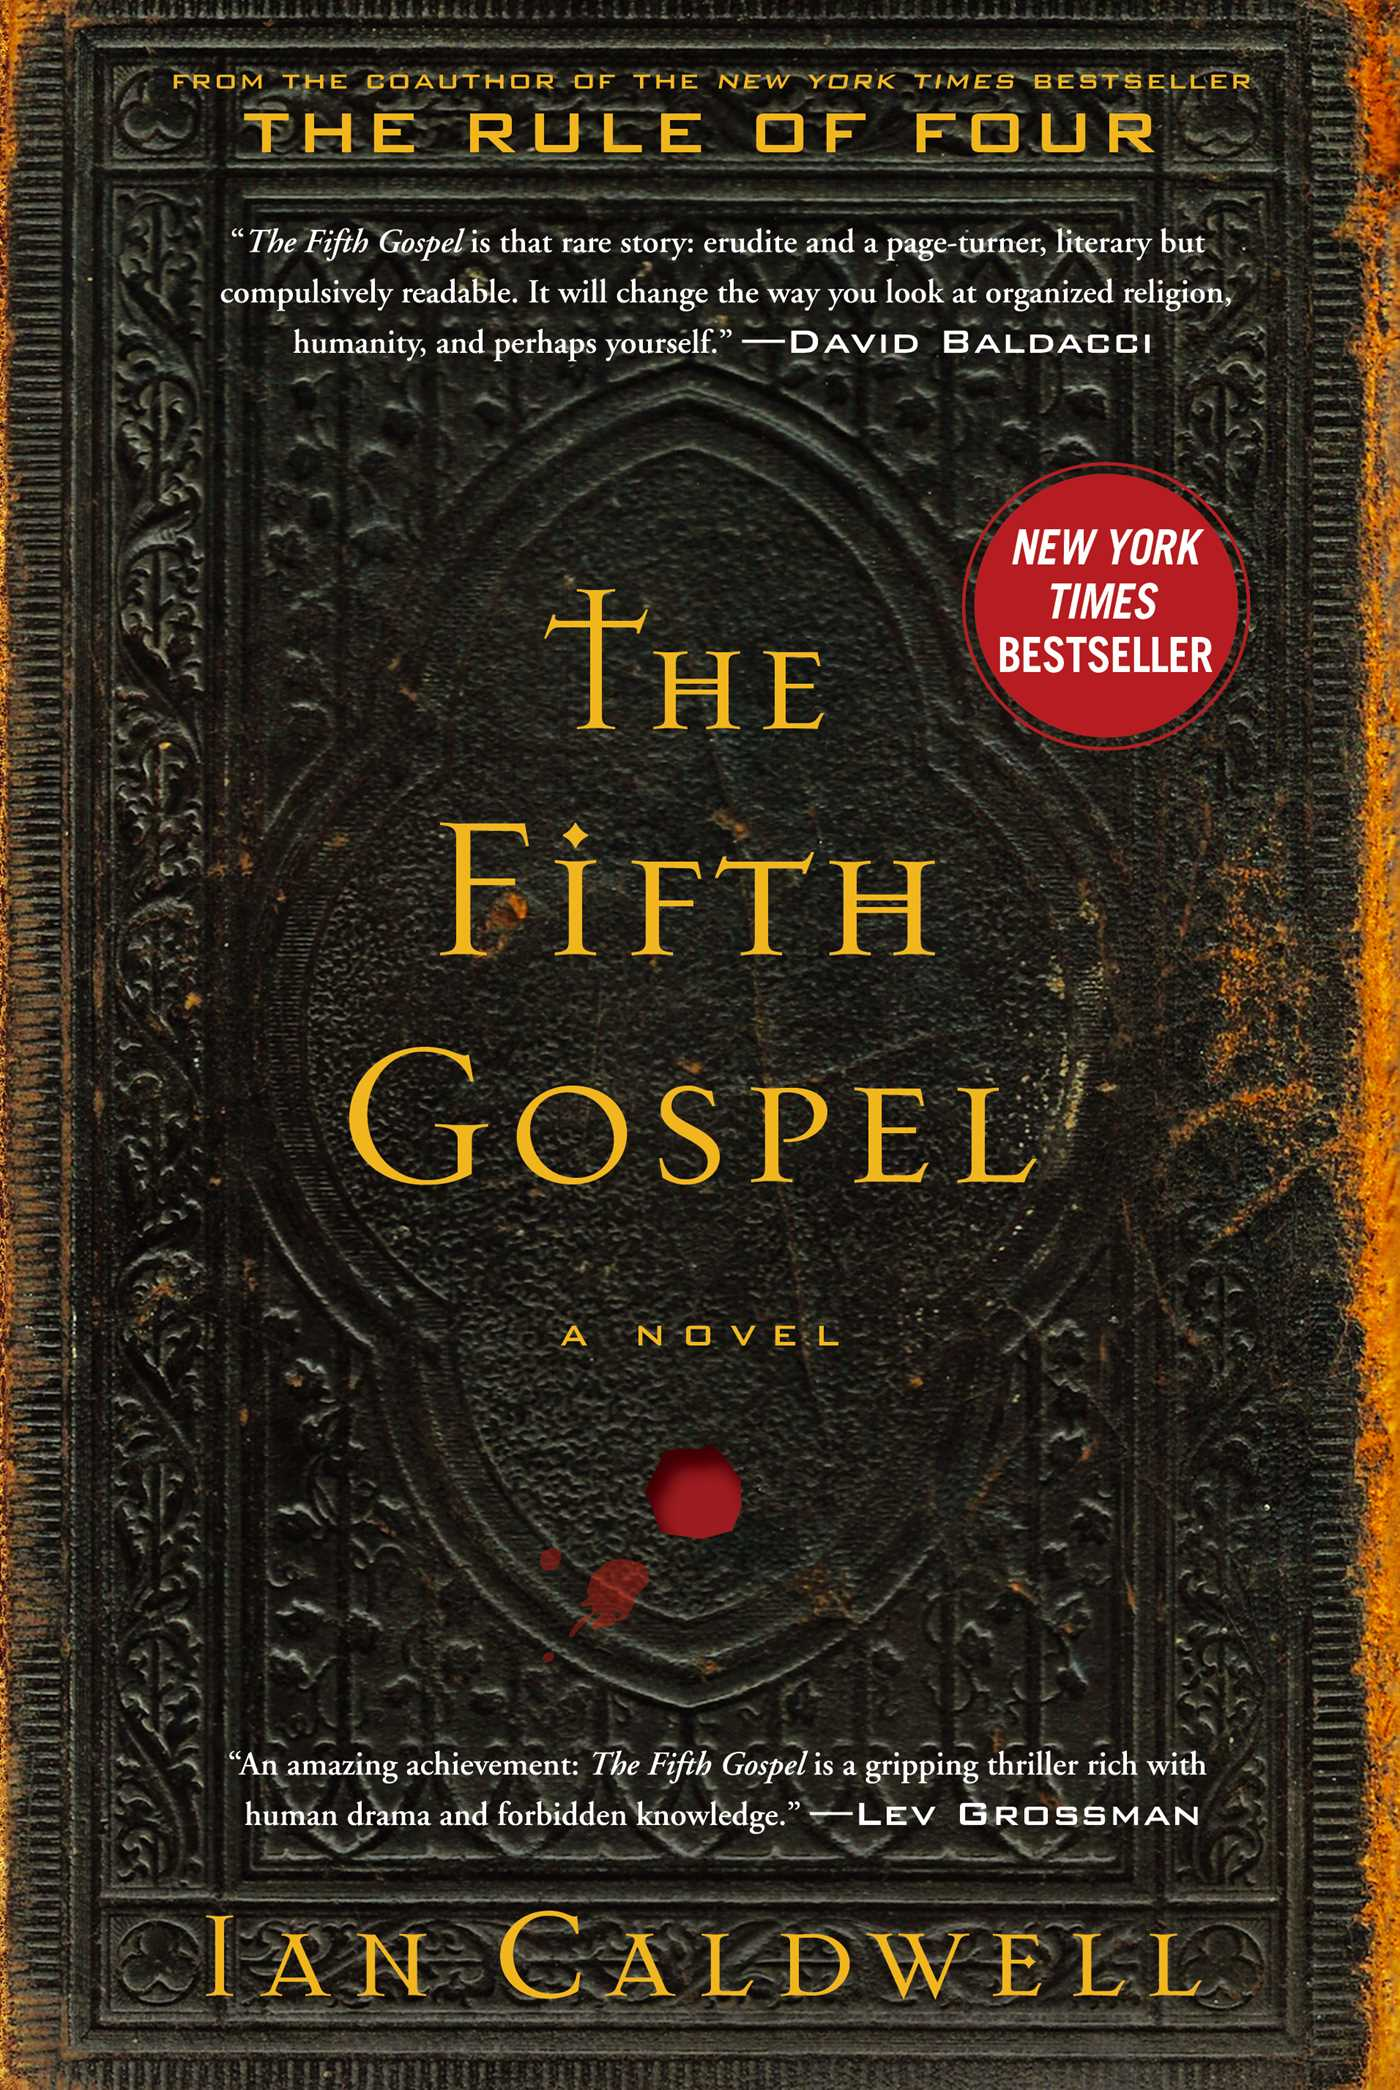 The fifth gospel 9781451694147 hr